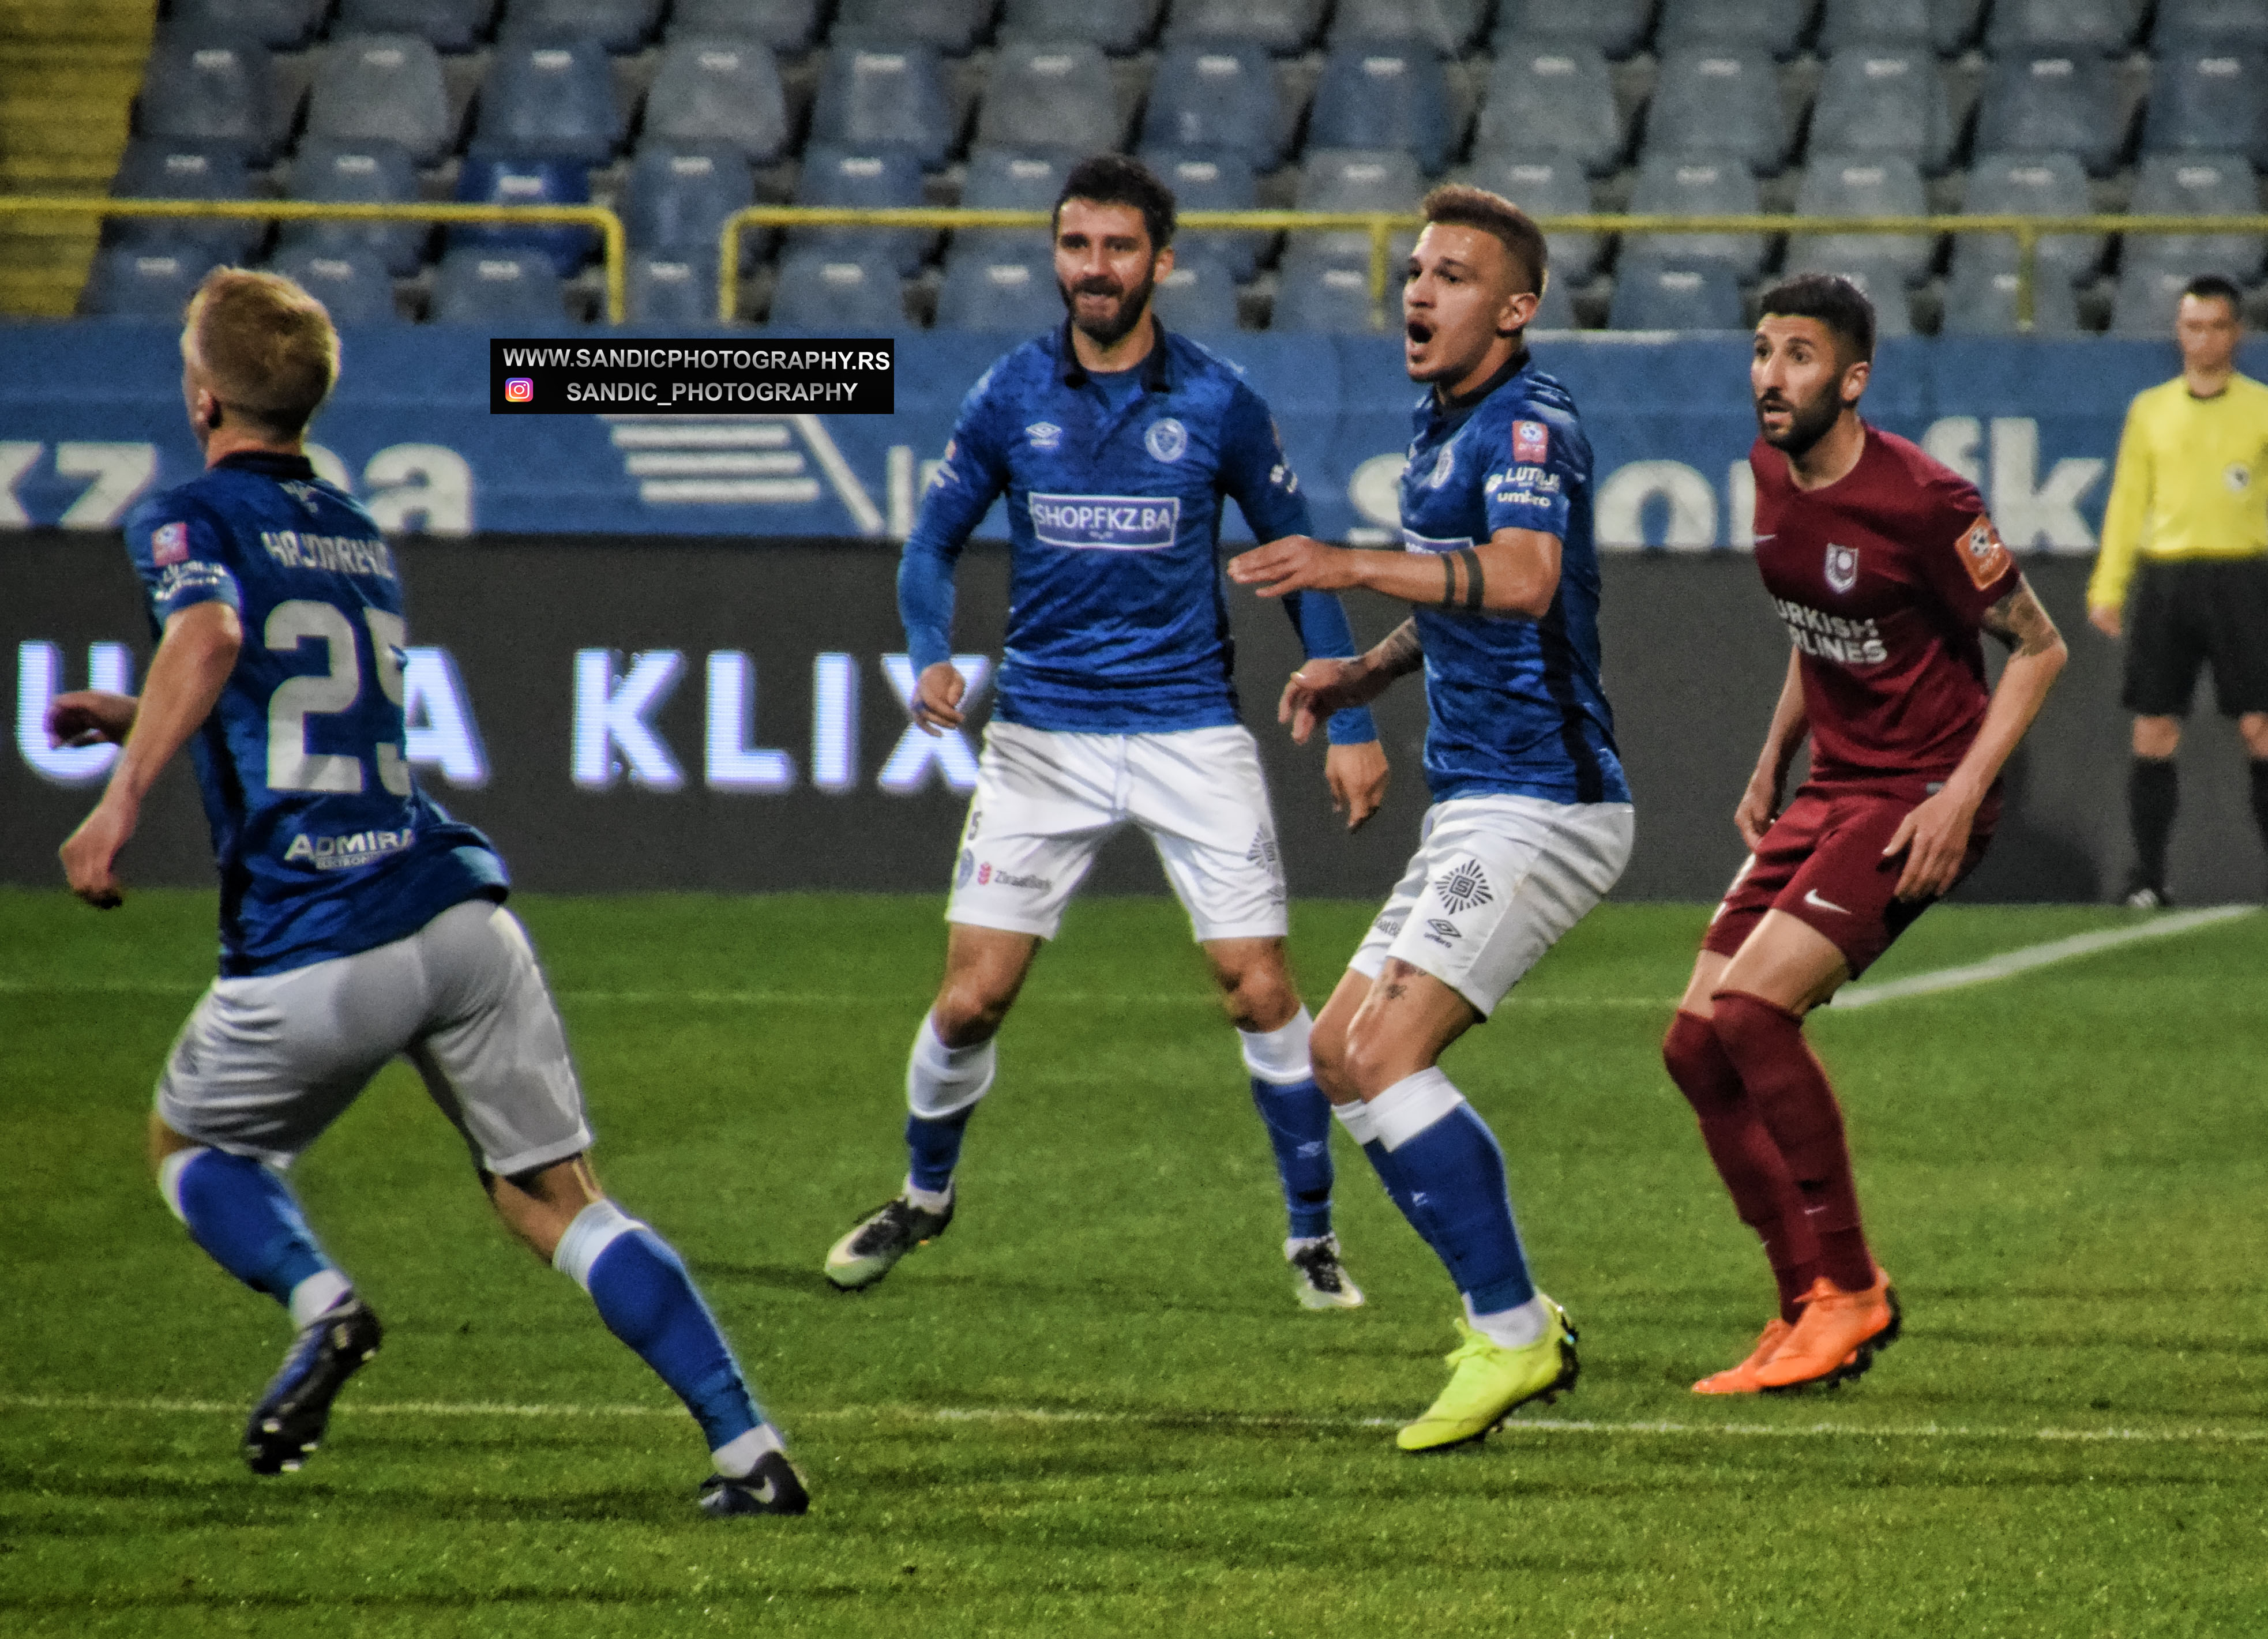 Premier League / Sarajevo 118 Derby / Željezničar